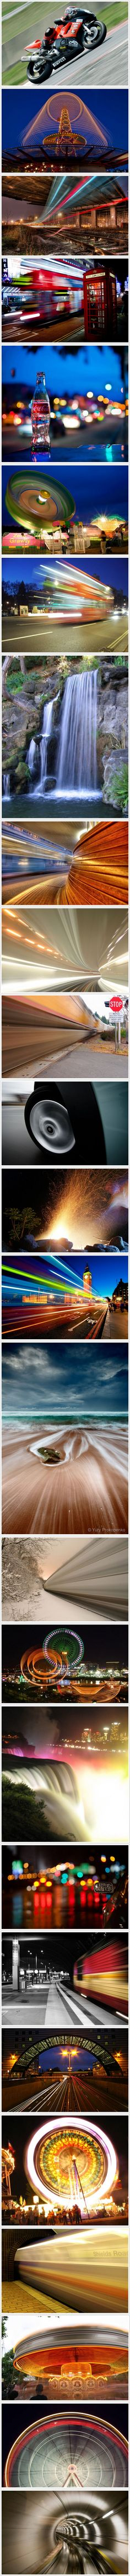 Motion Blur #Photography